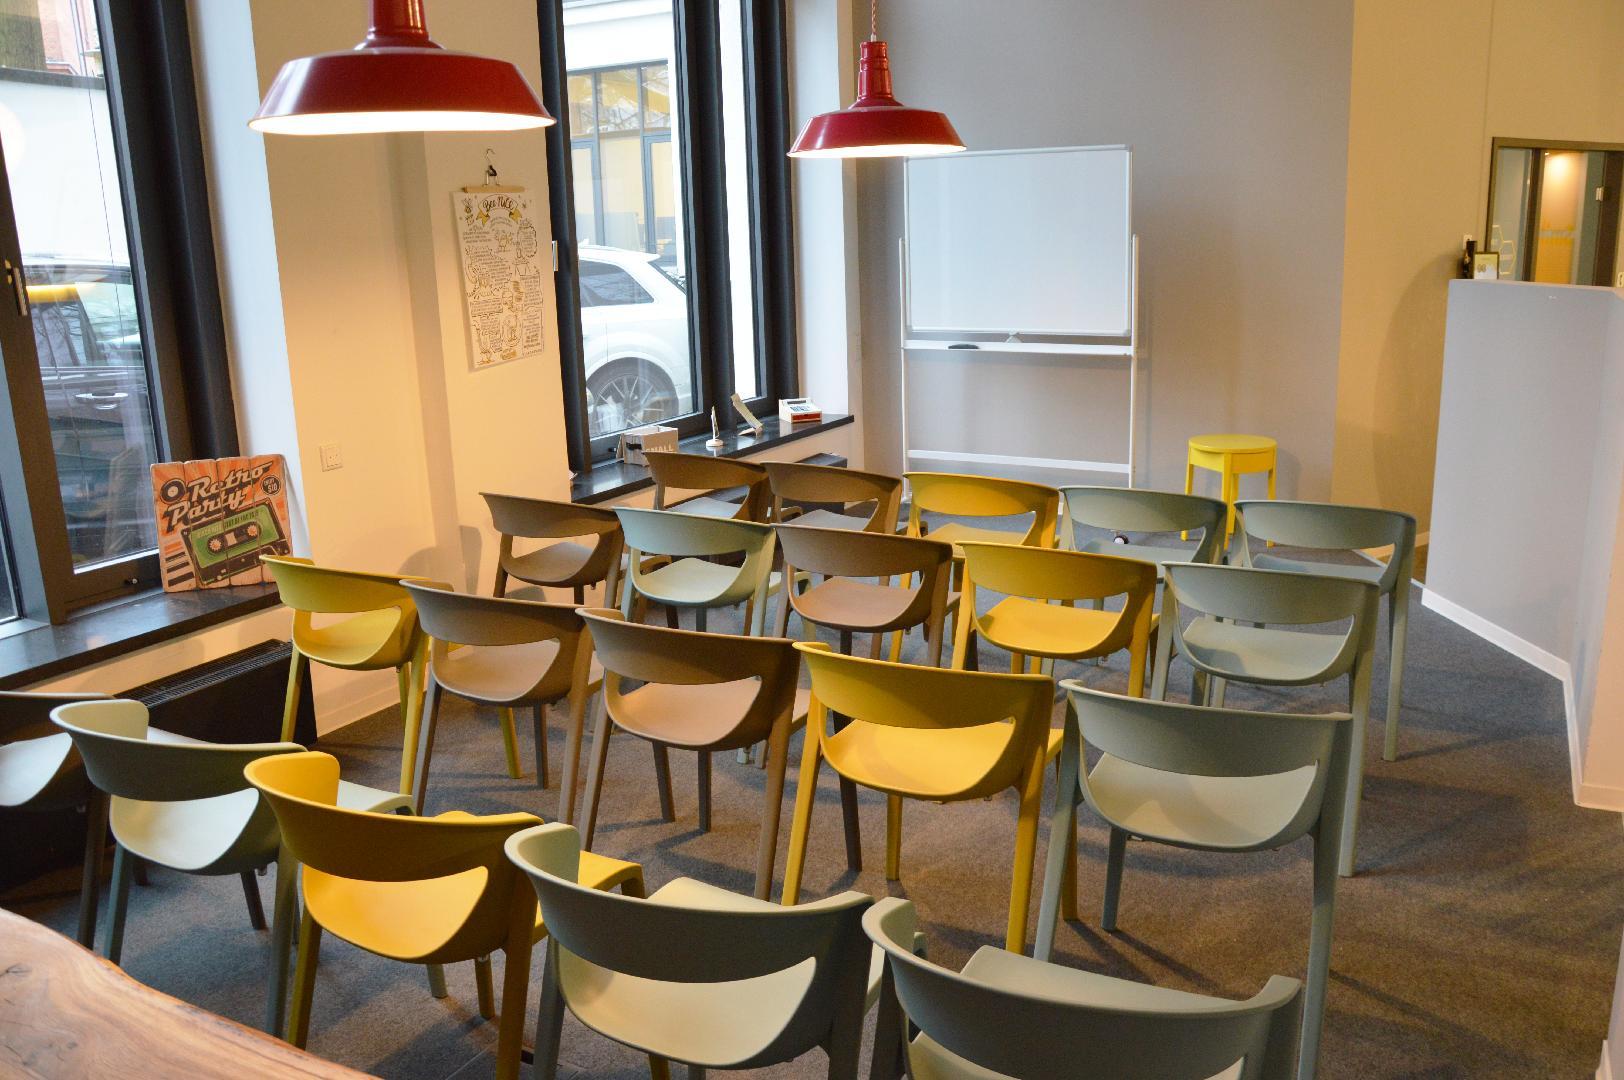 Picture 1 of BEEHIVE Hamburg Neustadt Coworking Space